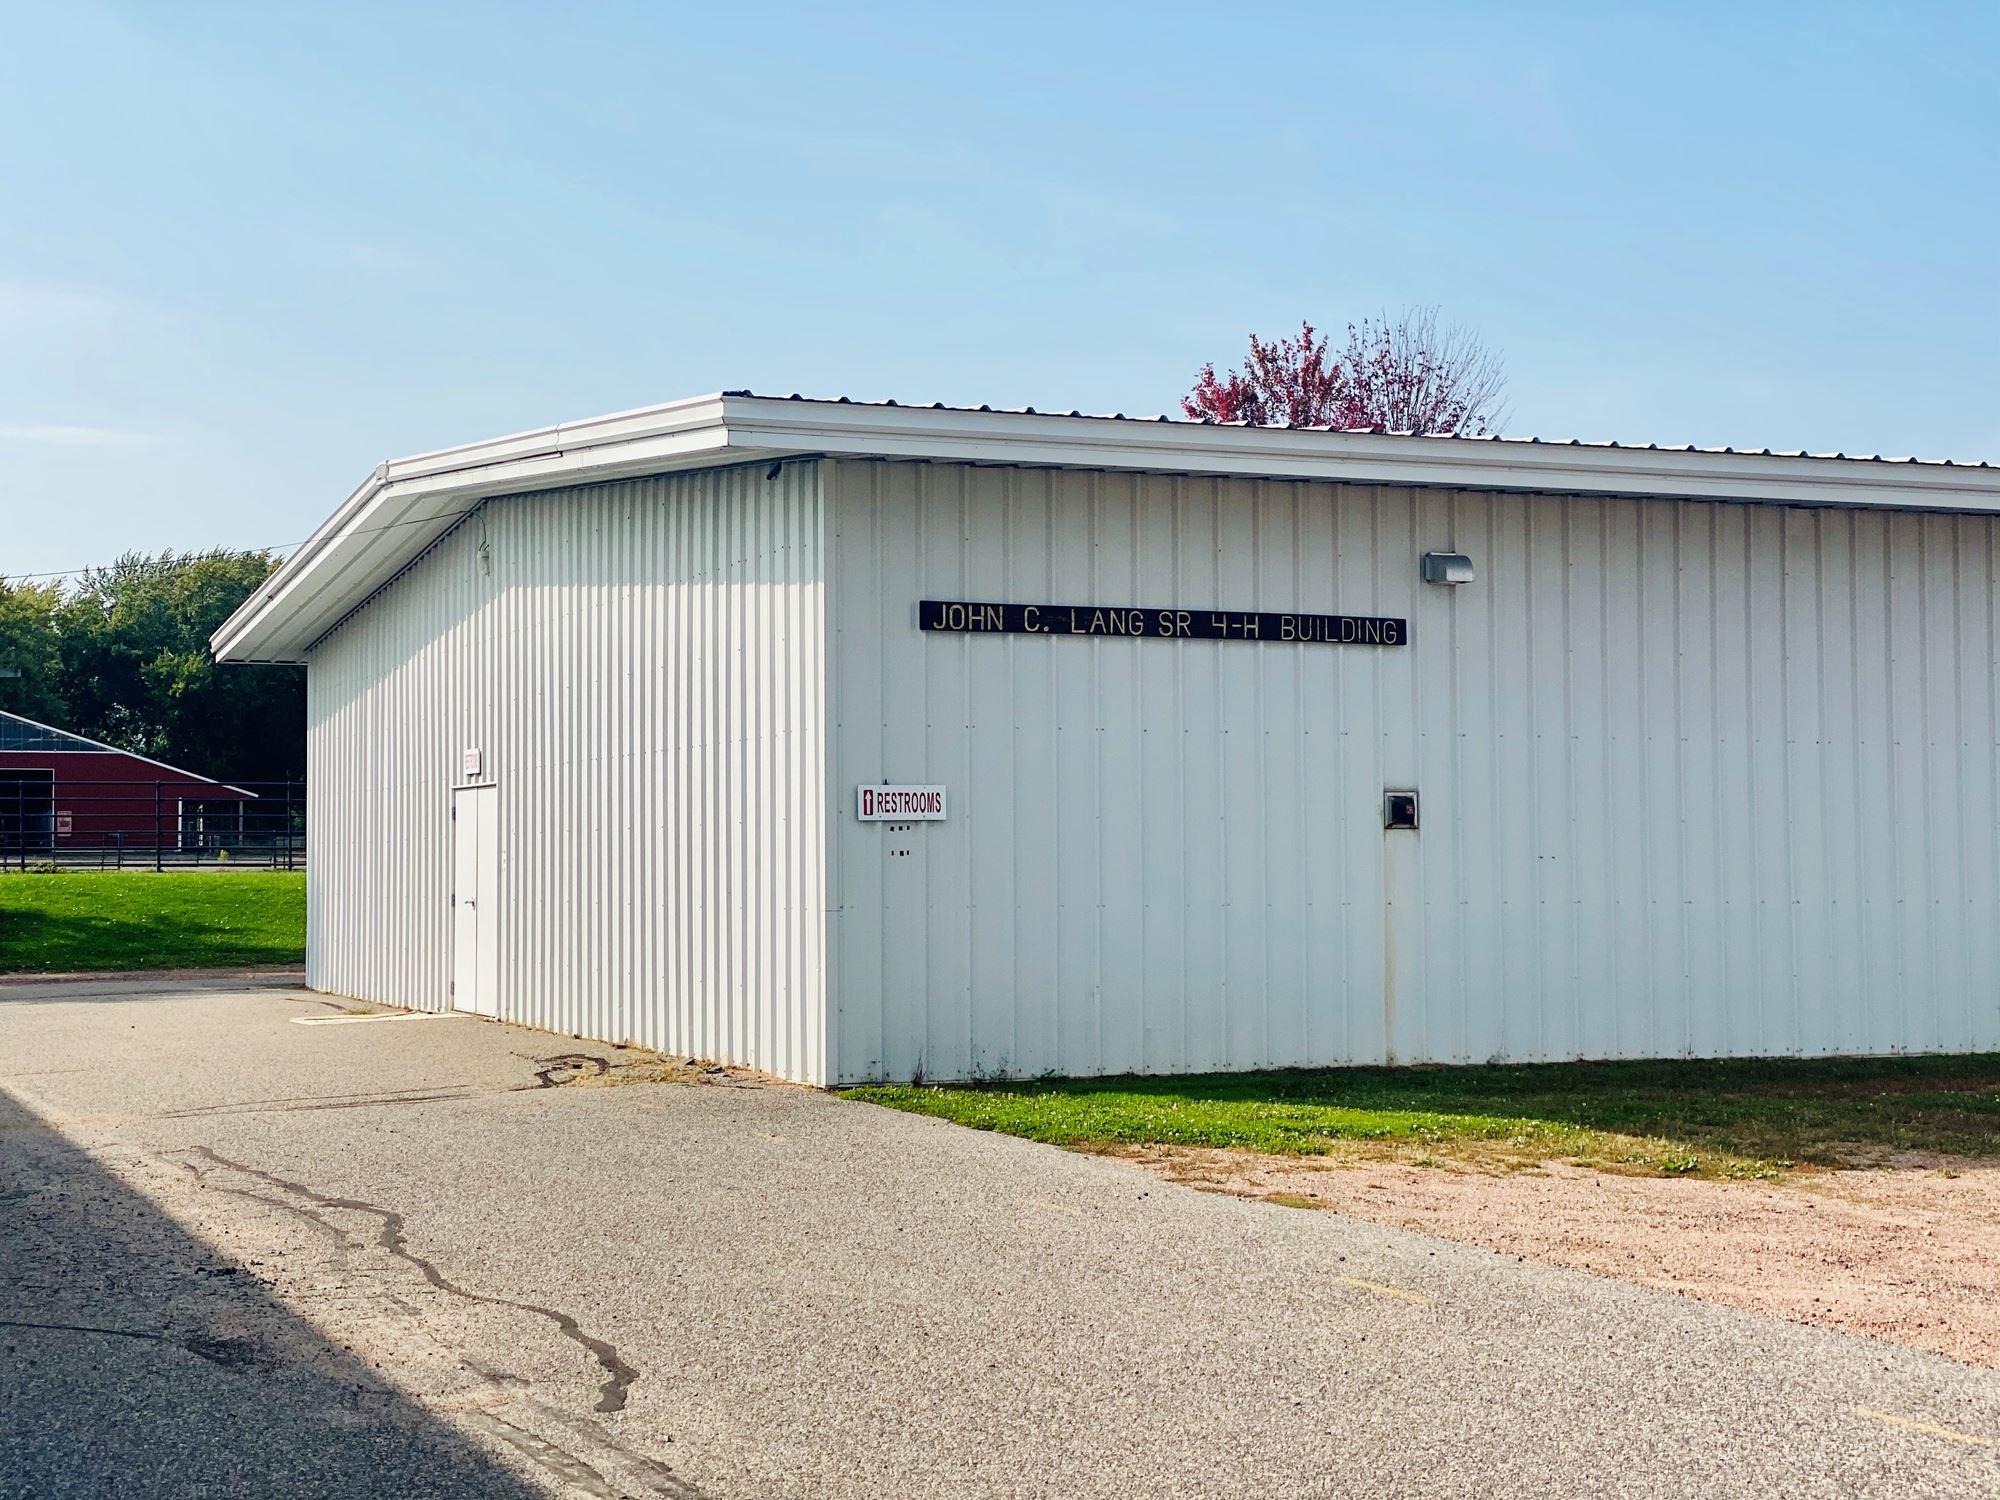 Lang 4-H Building